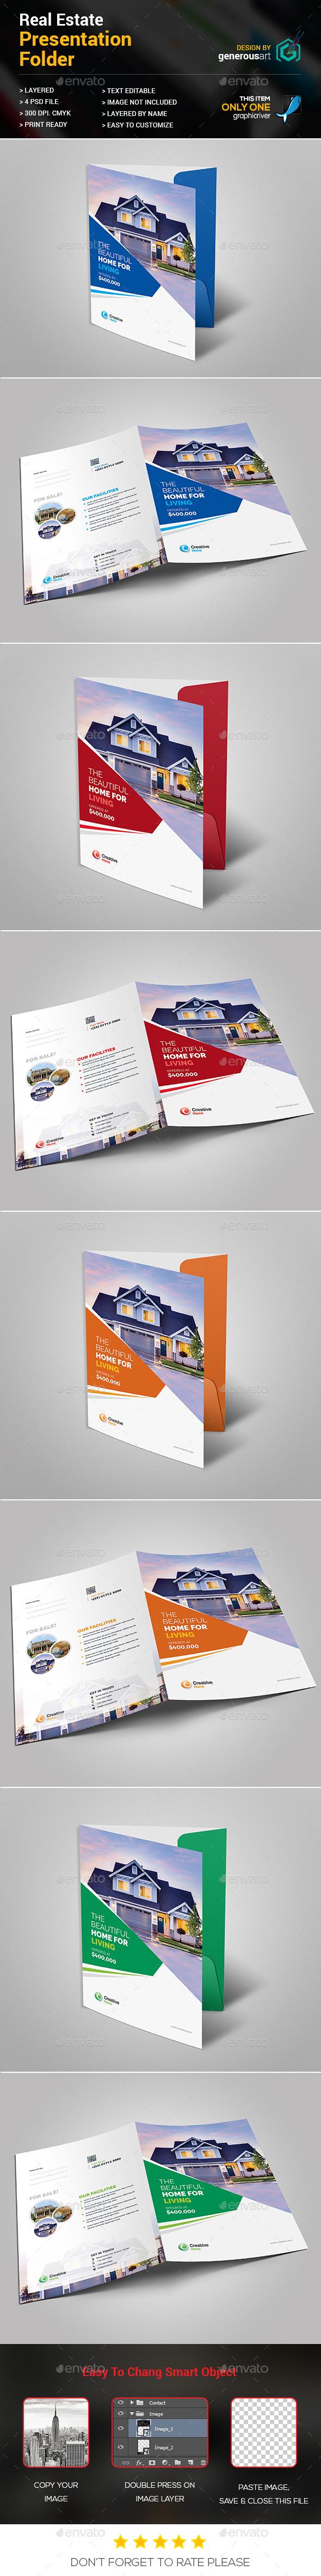 Real Estate Presentation Folder - Stationery Print Templates